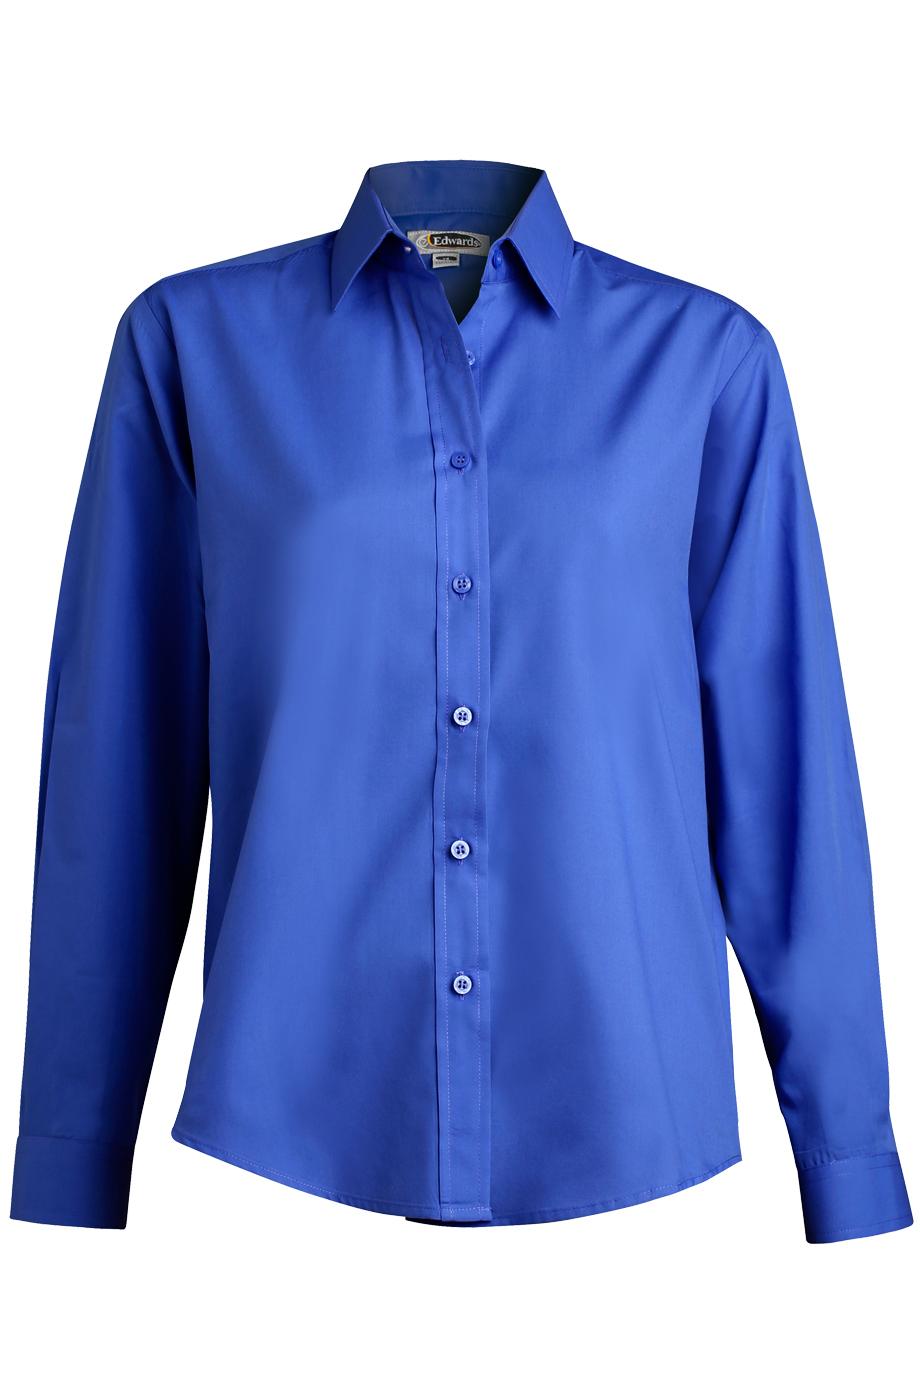 Women's Long Sleeve  Value Broadcloth Shirt5363